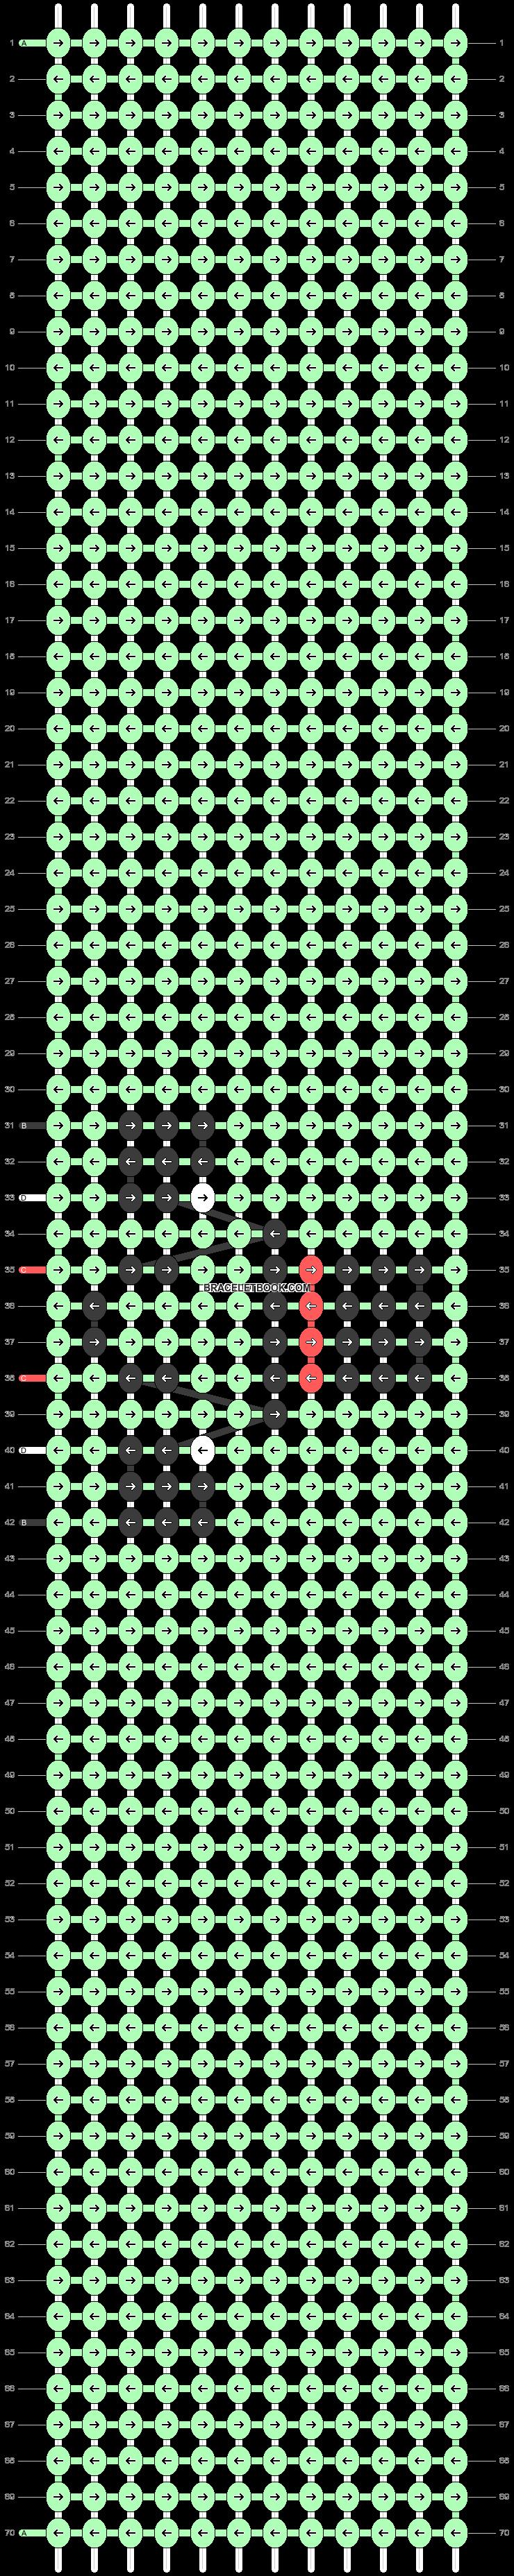 Alpha pattern #48581 pattern